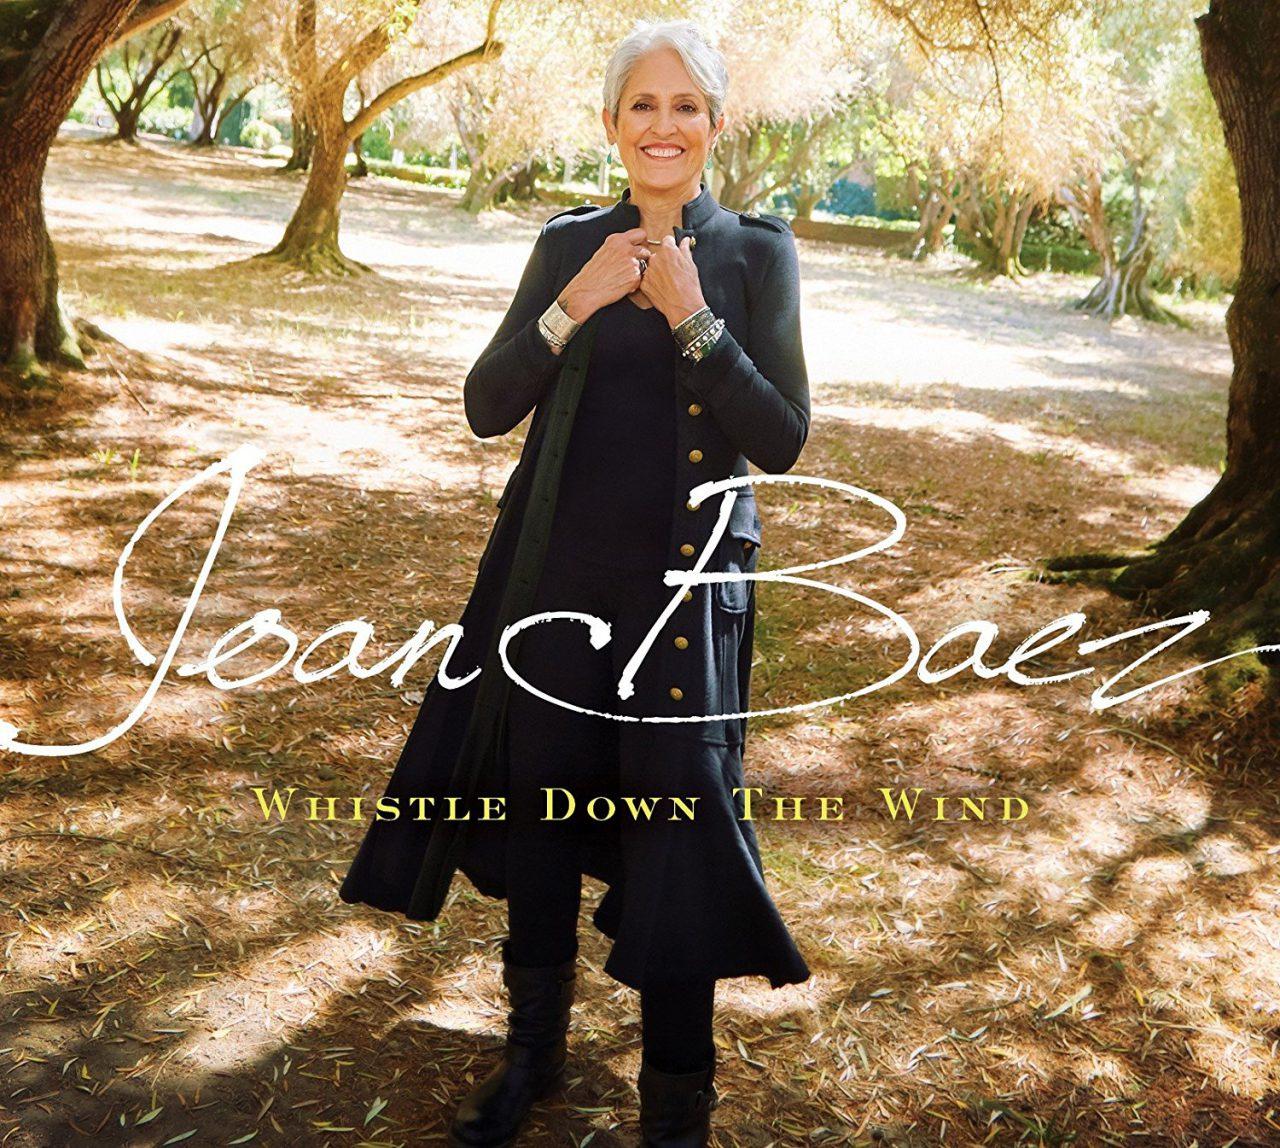 Joan Baez – Whistle Down The Wind